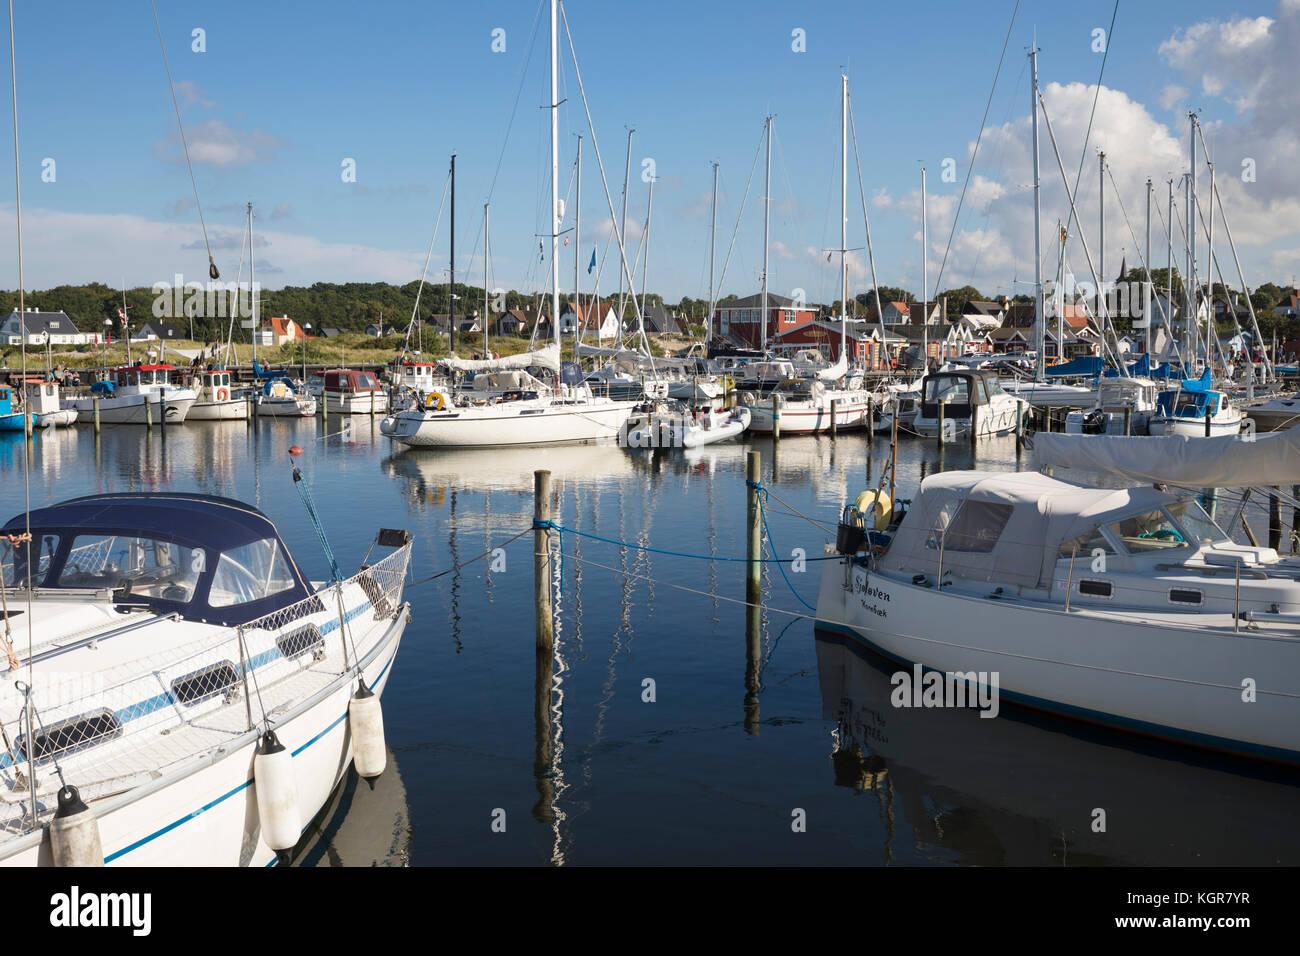 Boats in harbour of Hornbaek, Hornbaek, Kattegat Coast, Zealand, Denmark, Europe - Stock Image